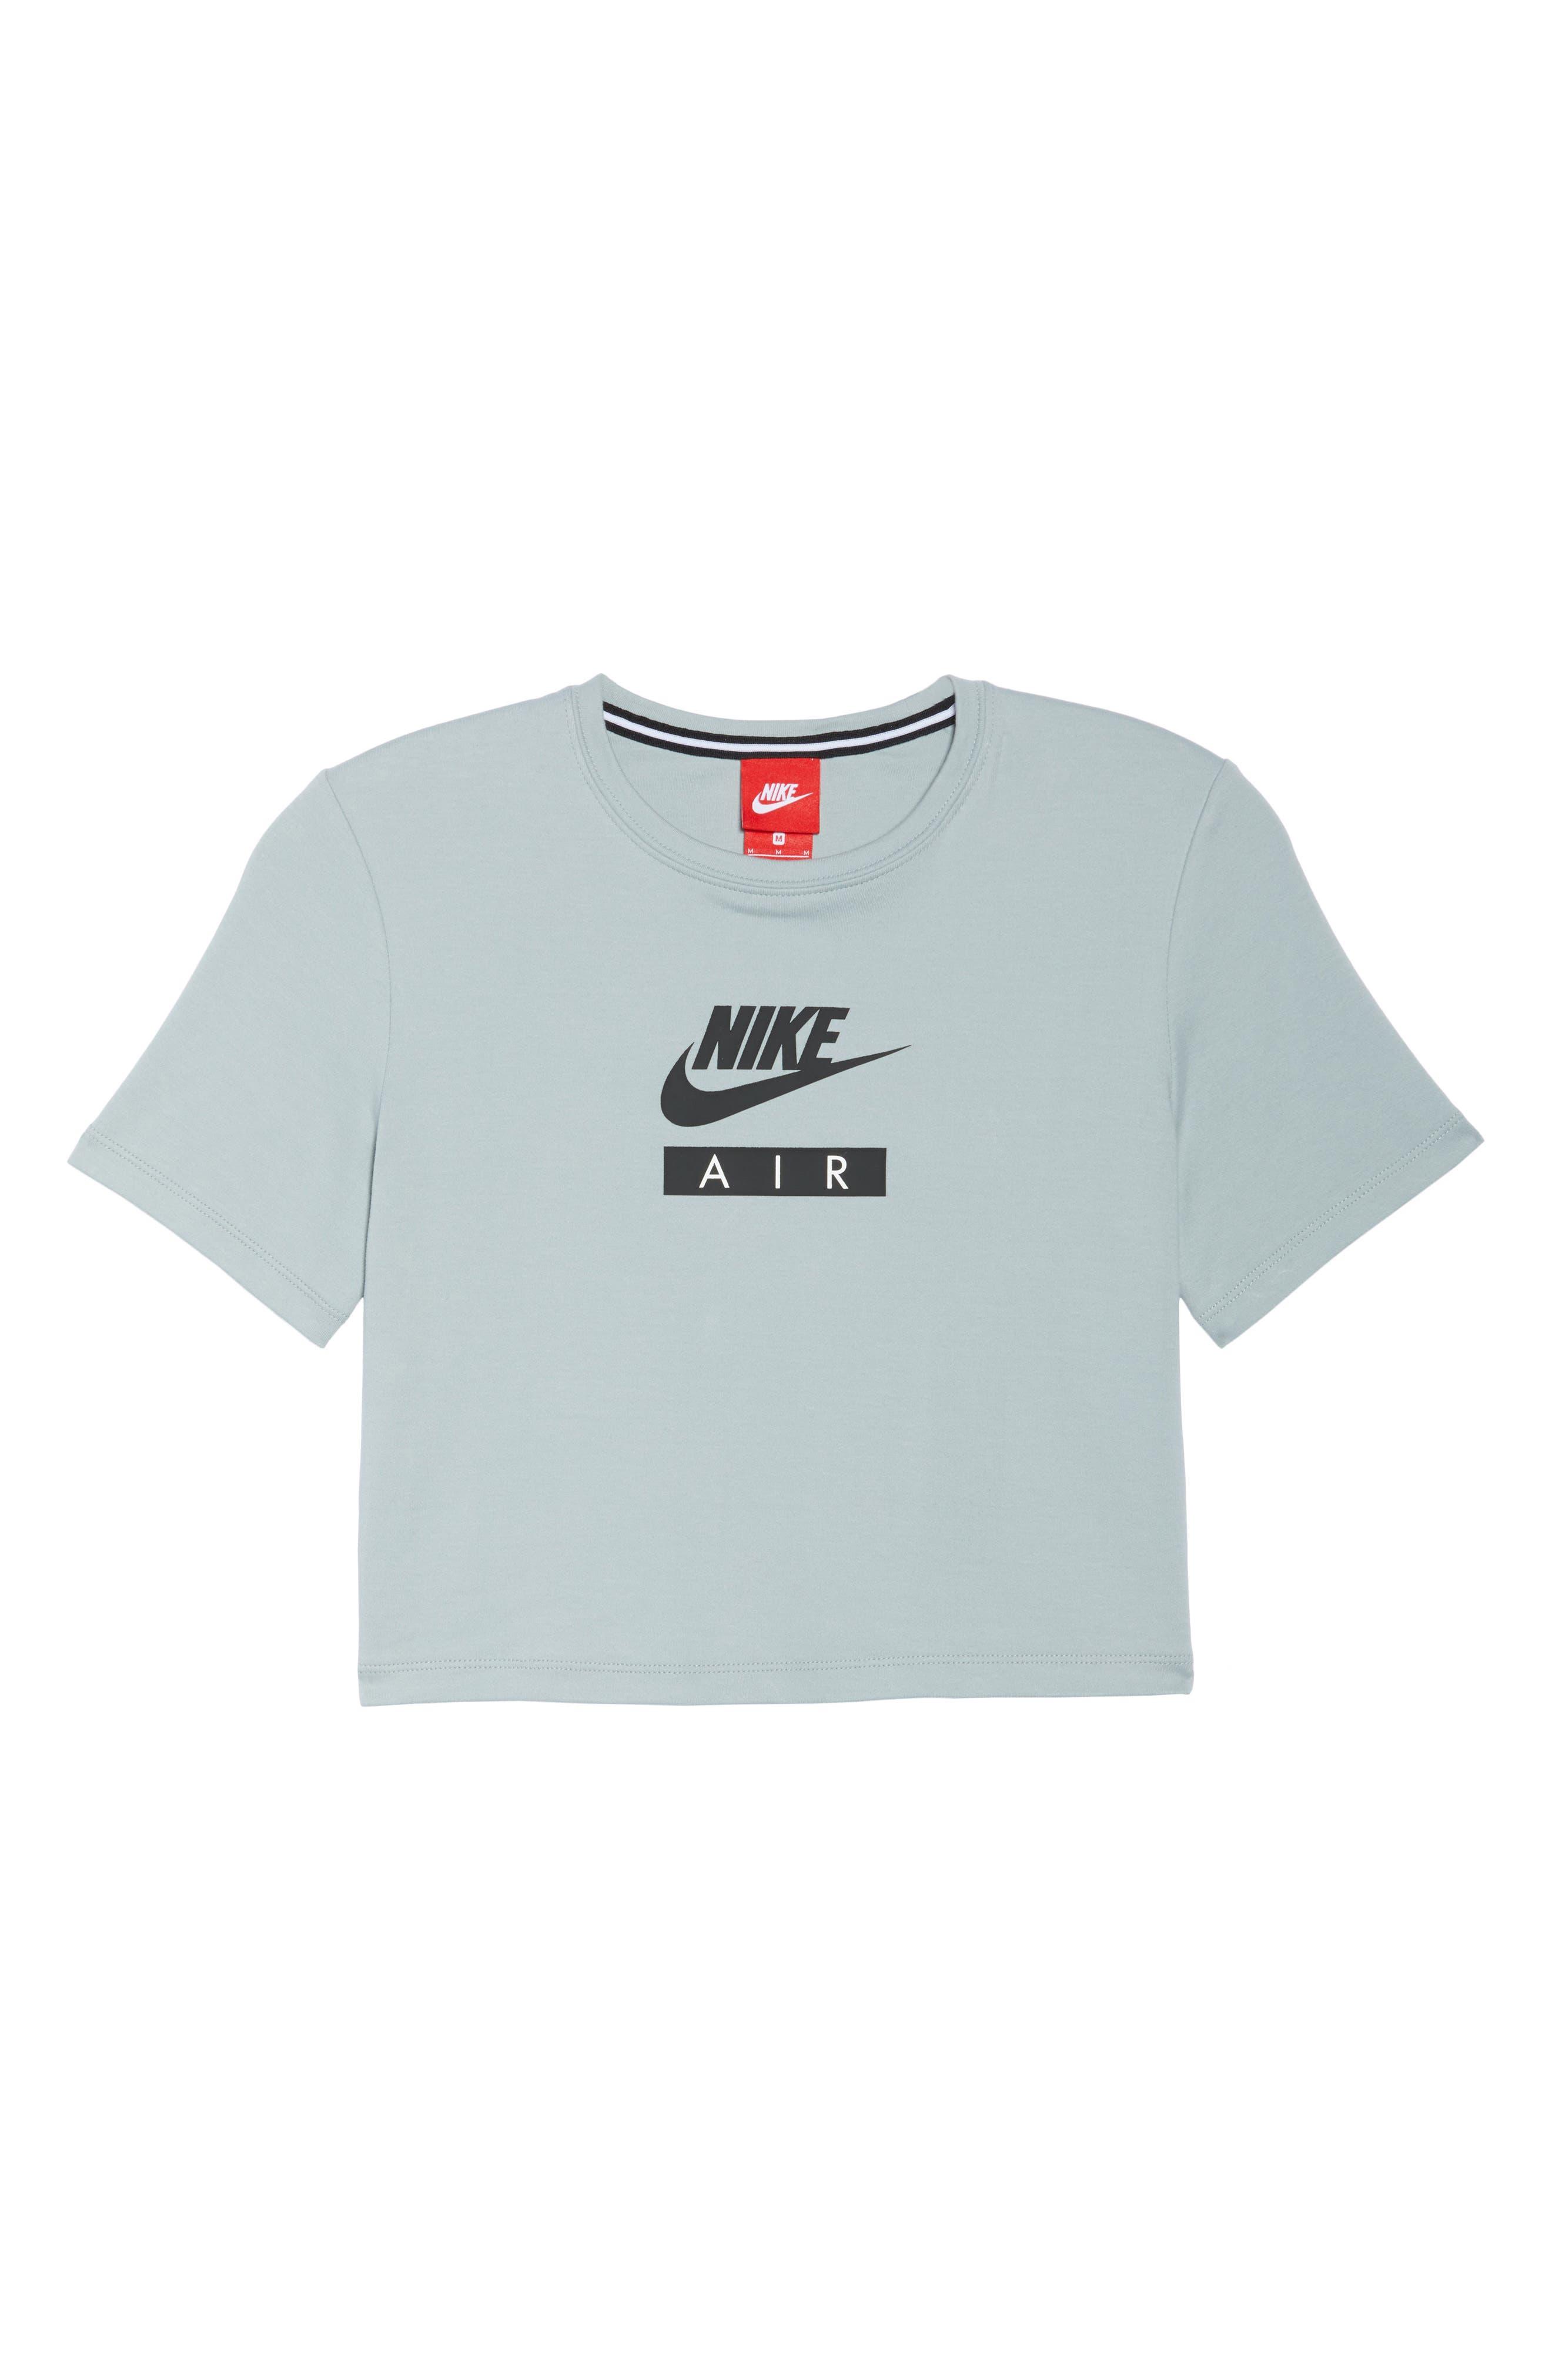 Sportswear Baby Air Crop Tee,                             Main thumbnail 1, color,                             LIGHT PUMICE/ BLACK